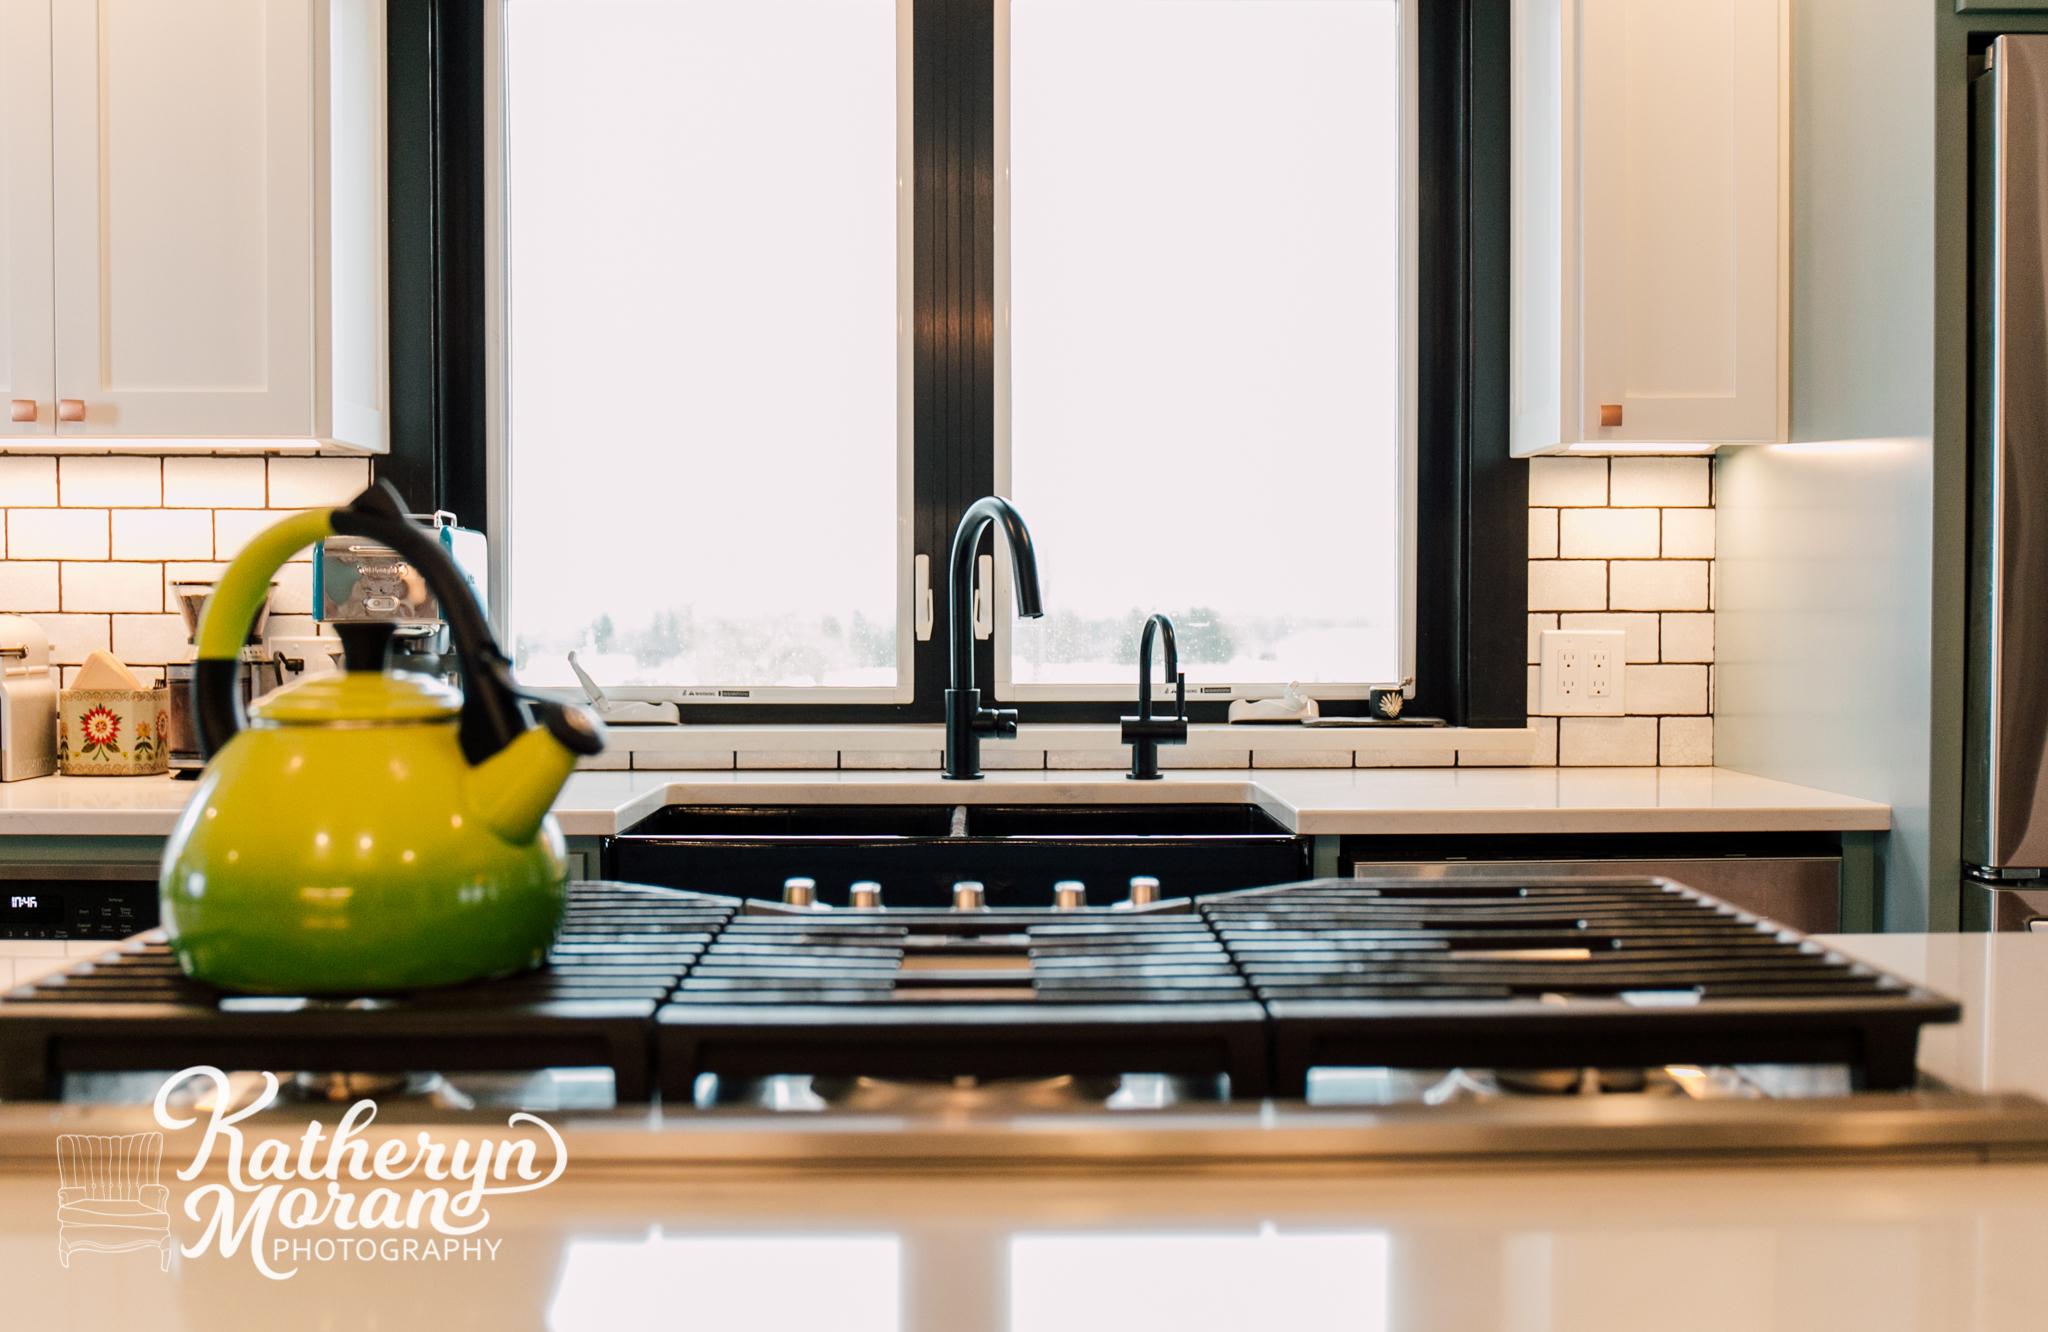 bellingham-photographer-katheryn-moran-jennifer-ryan-designs-interior-design-ferndale-kitchen-2019-1-2.jpg